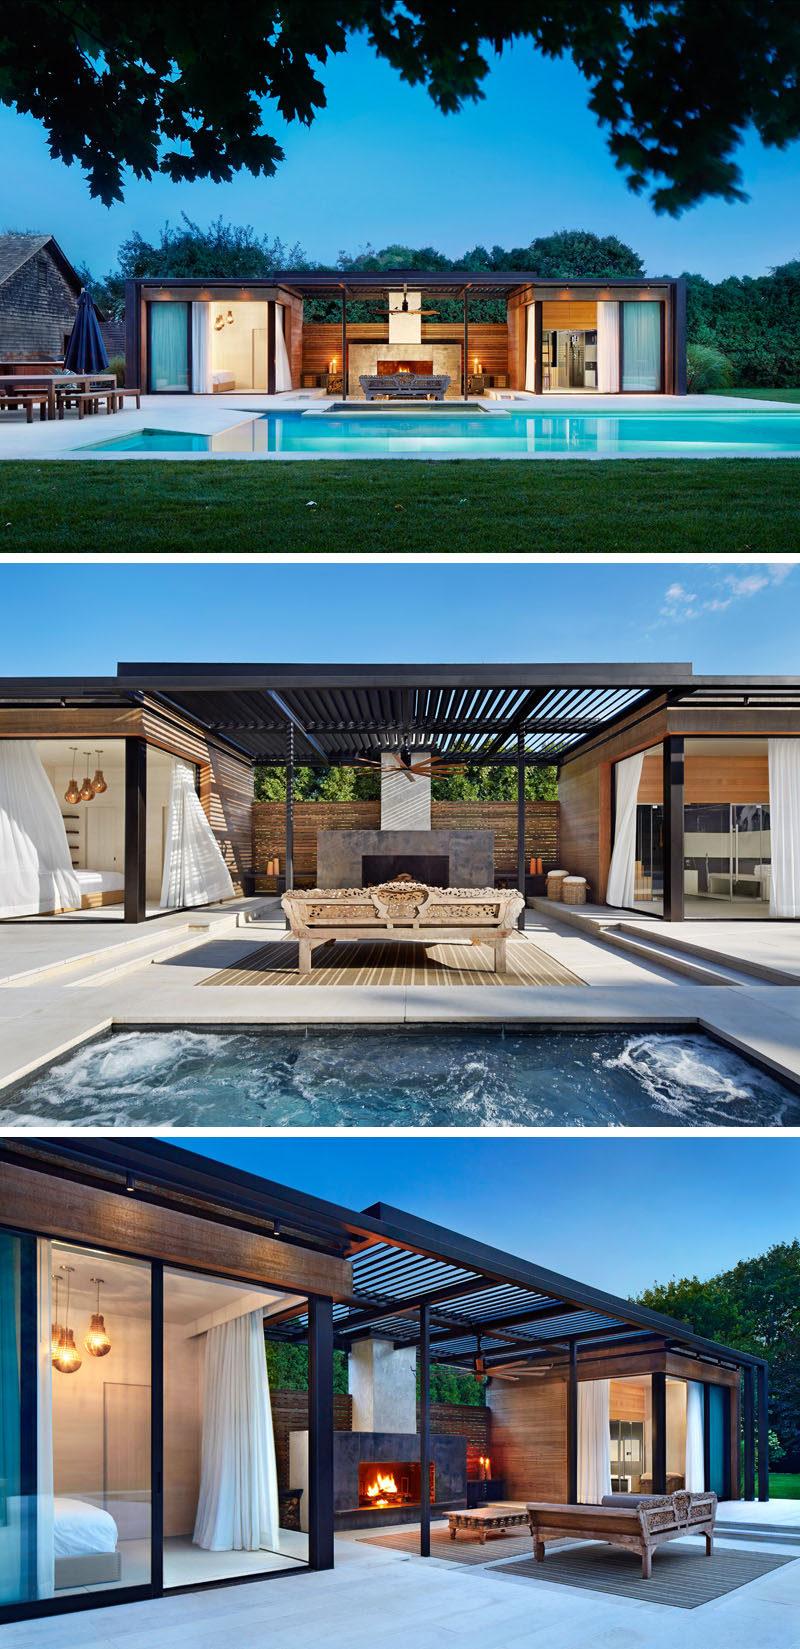 Landscaping Design Ideas - 11 Backyards Designed For ... on Backyard House Ideas id=21994